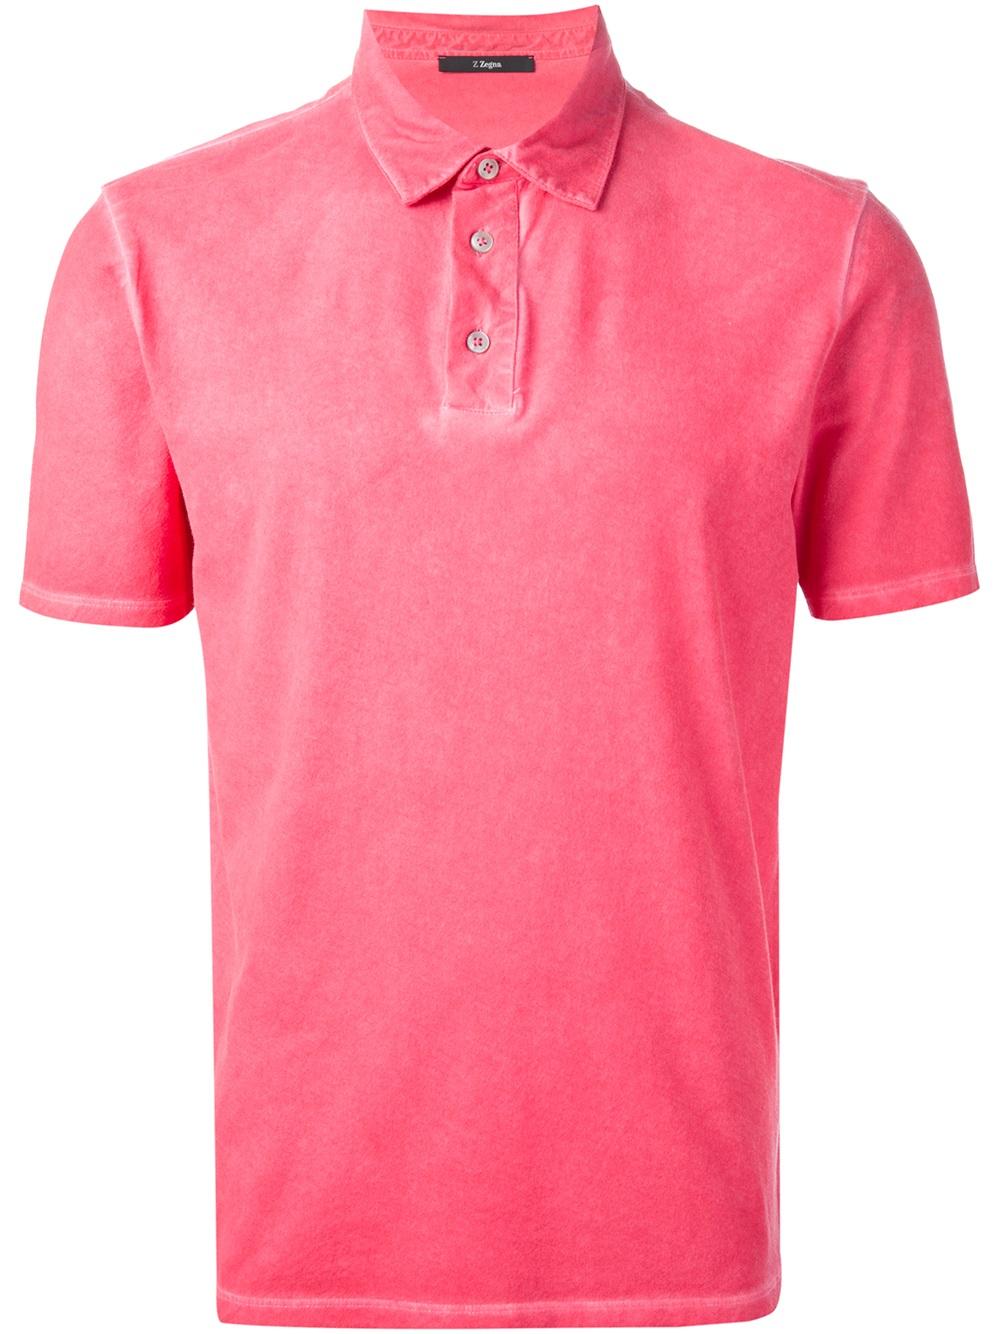 ermenegildo zegna classic polo shirt in pink for men lyst. Black Bedroom Furniture Sets. Home Design Ideas